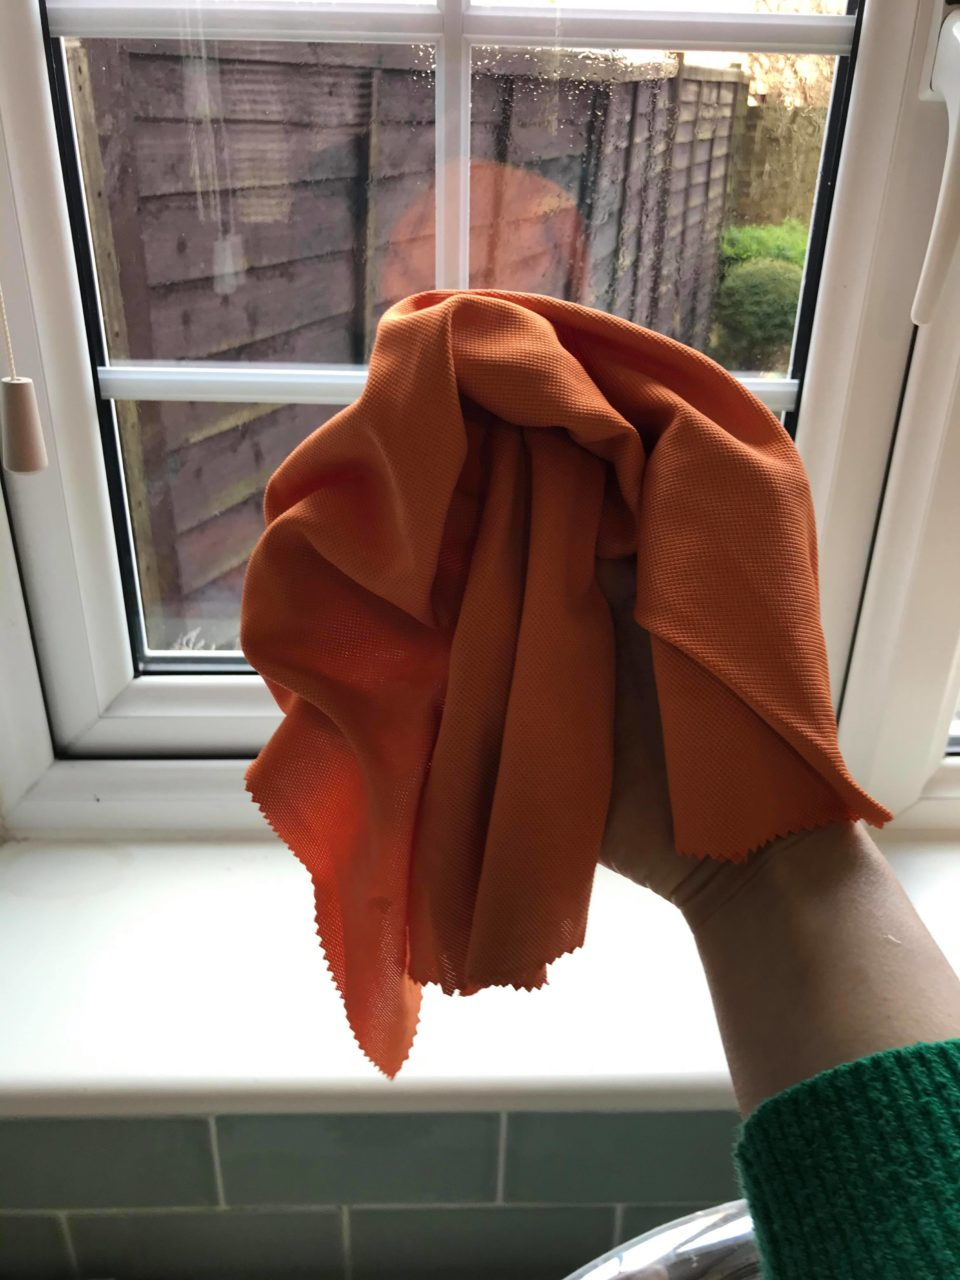 the polishing cloth